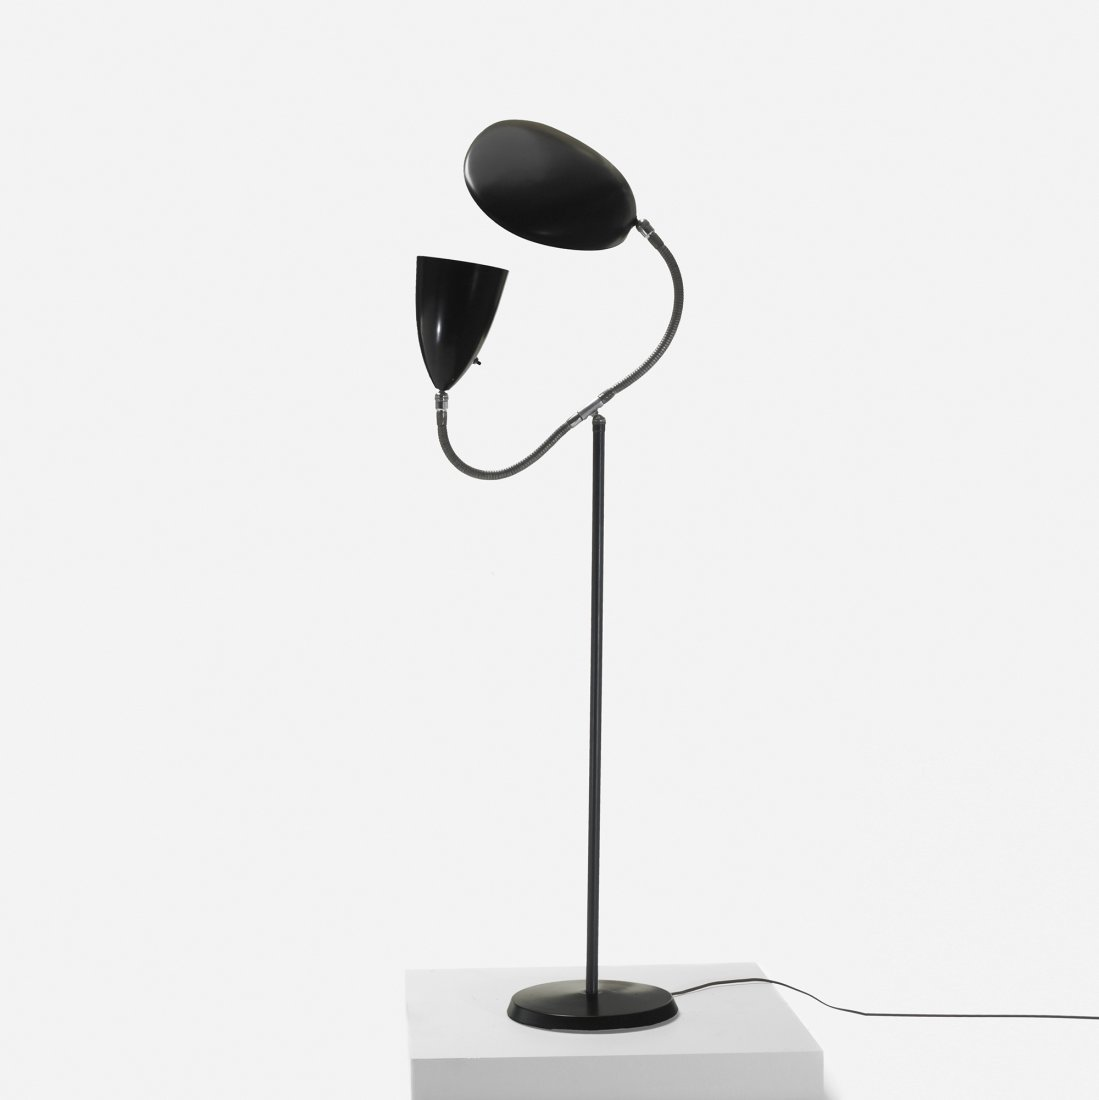 105: Grossman rare double neck floor lamp